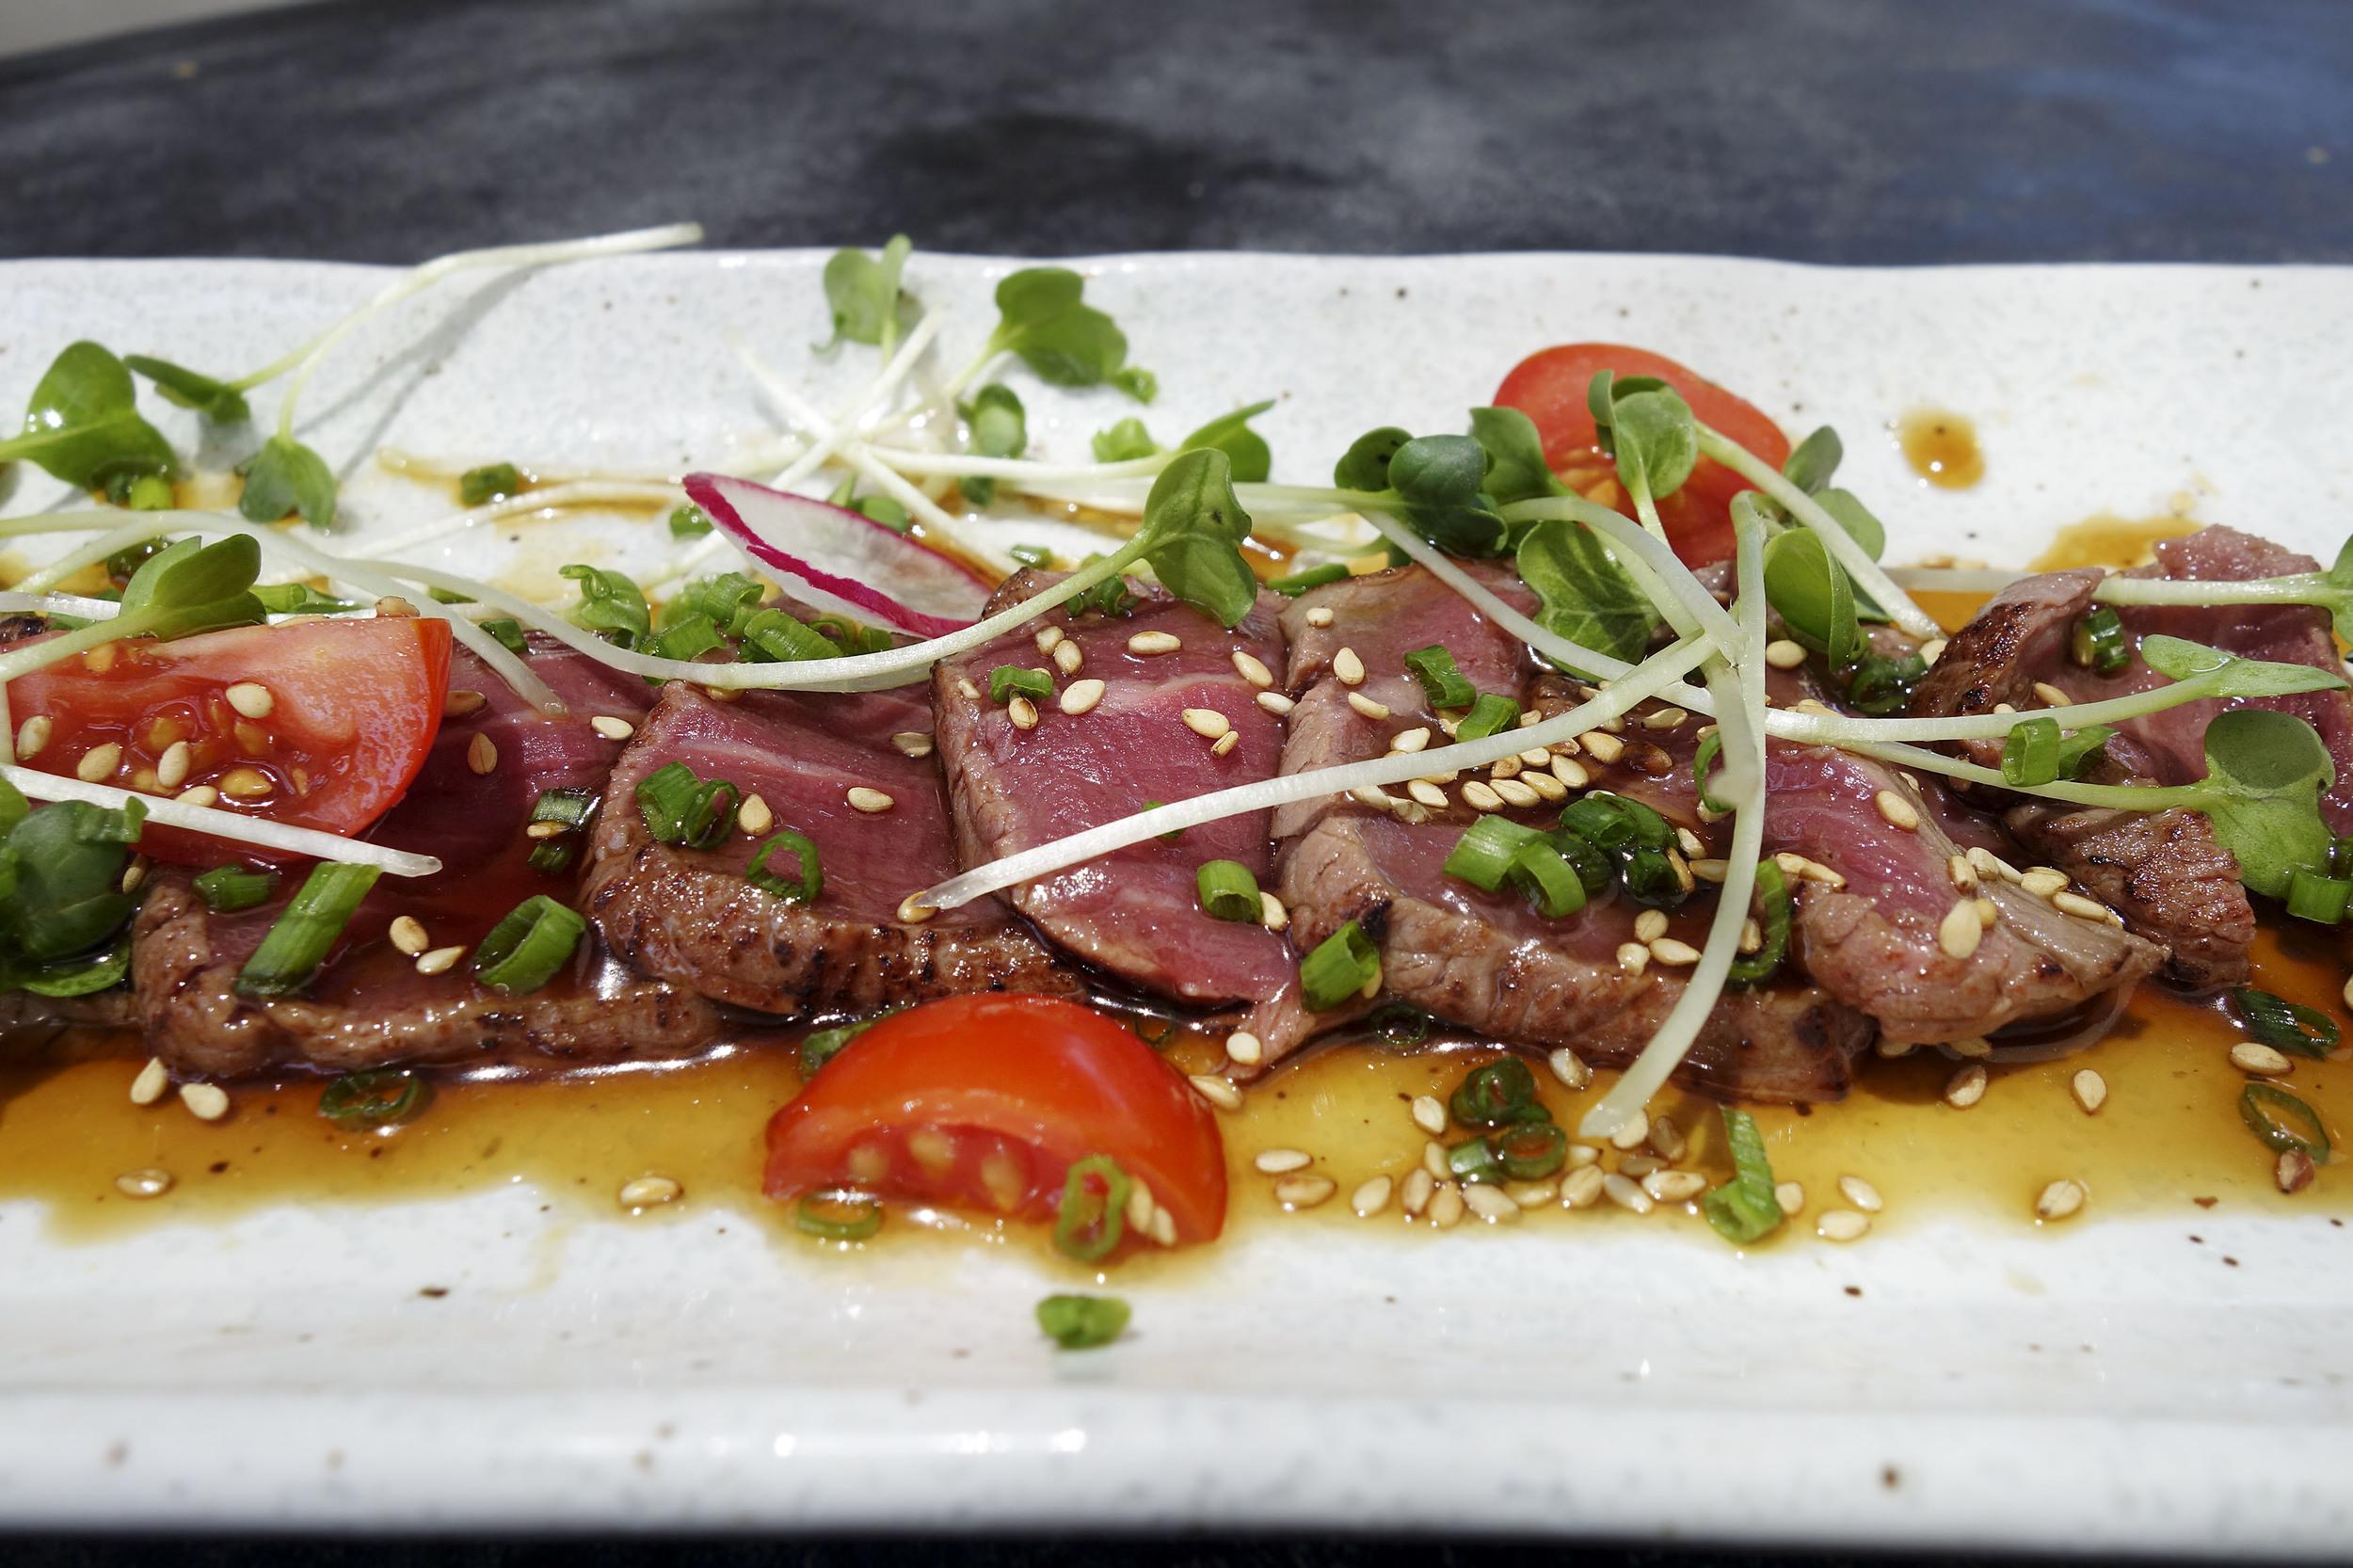 Beef Tataki - Seared with House Special Yuzu soy.